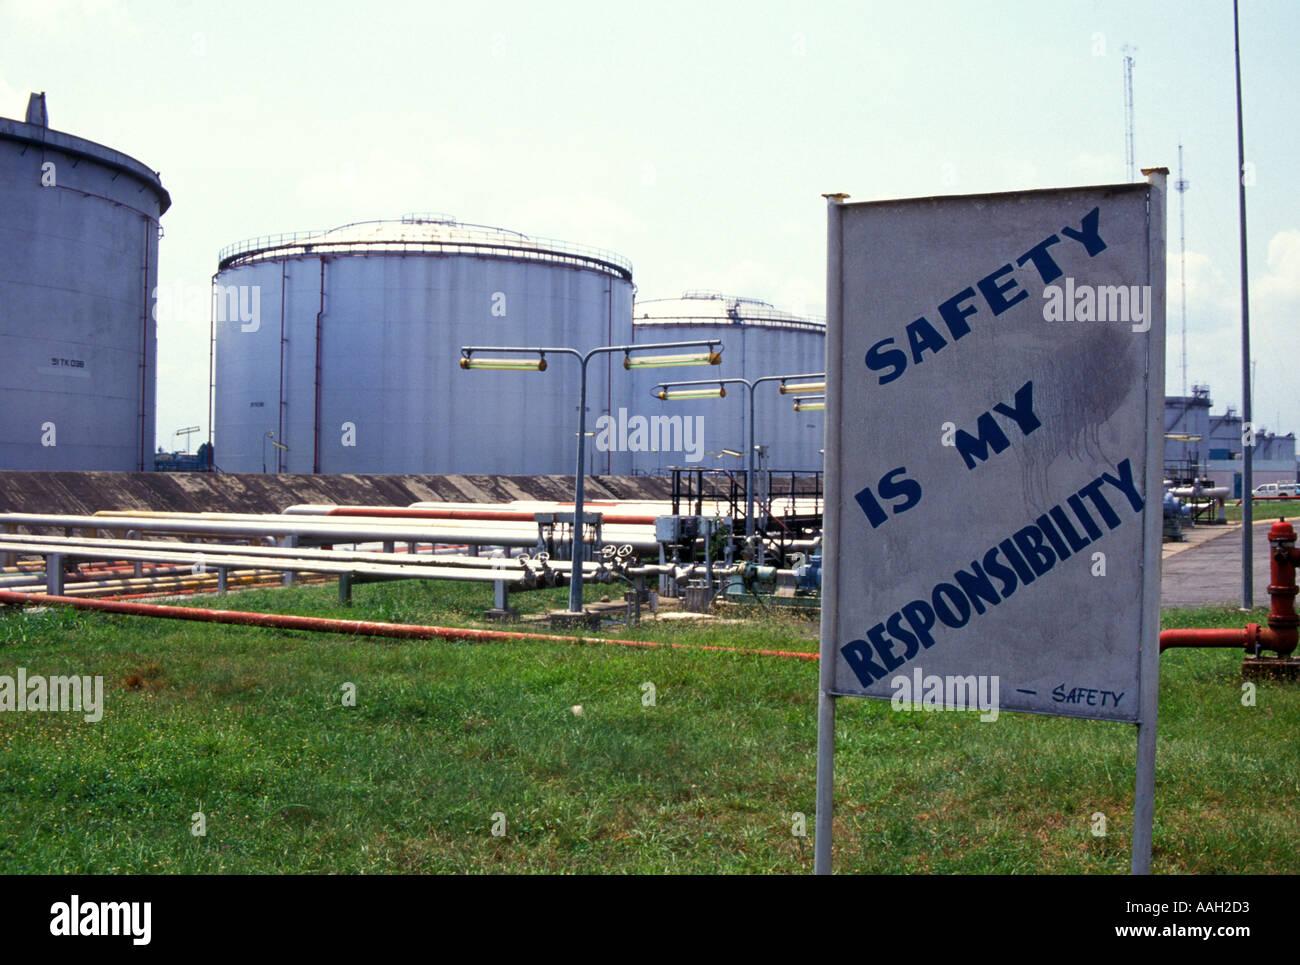 Oil Refinery, Port Harcourt, Nigeria - Stock Image